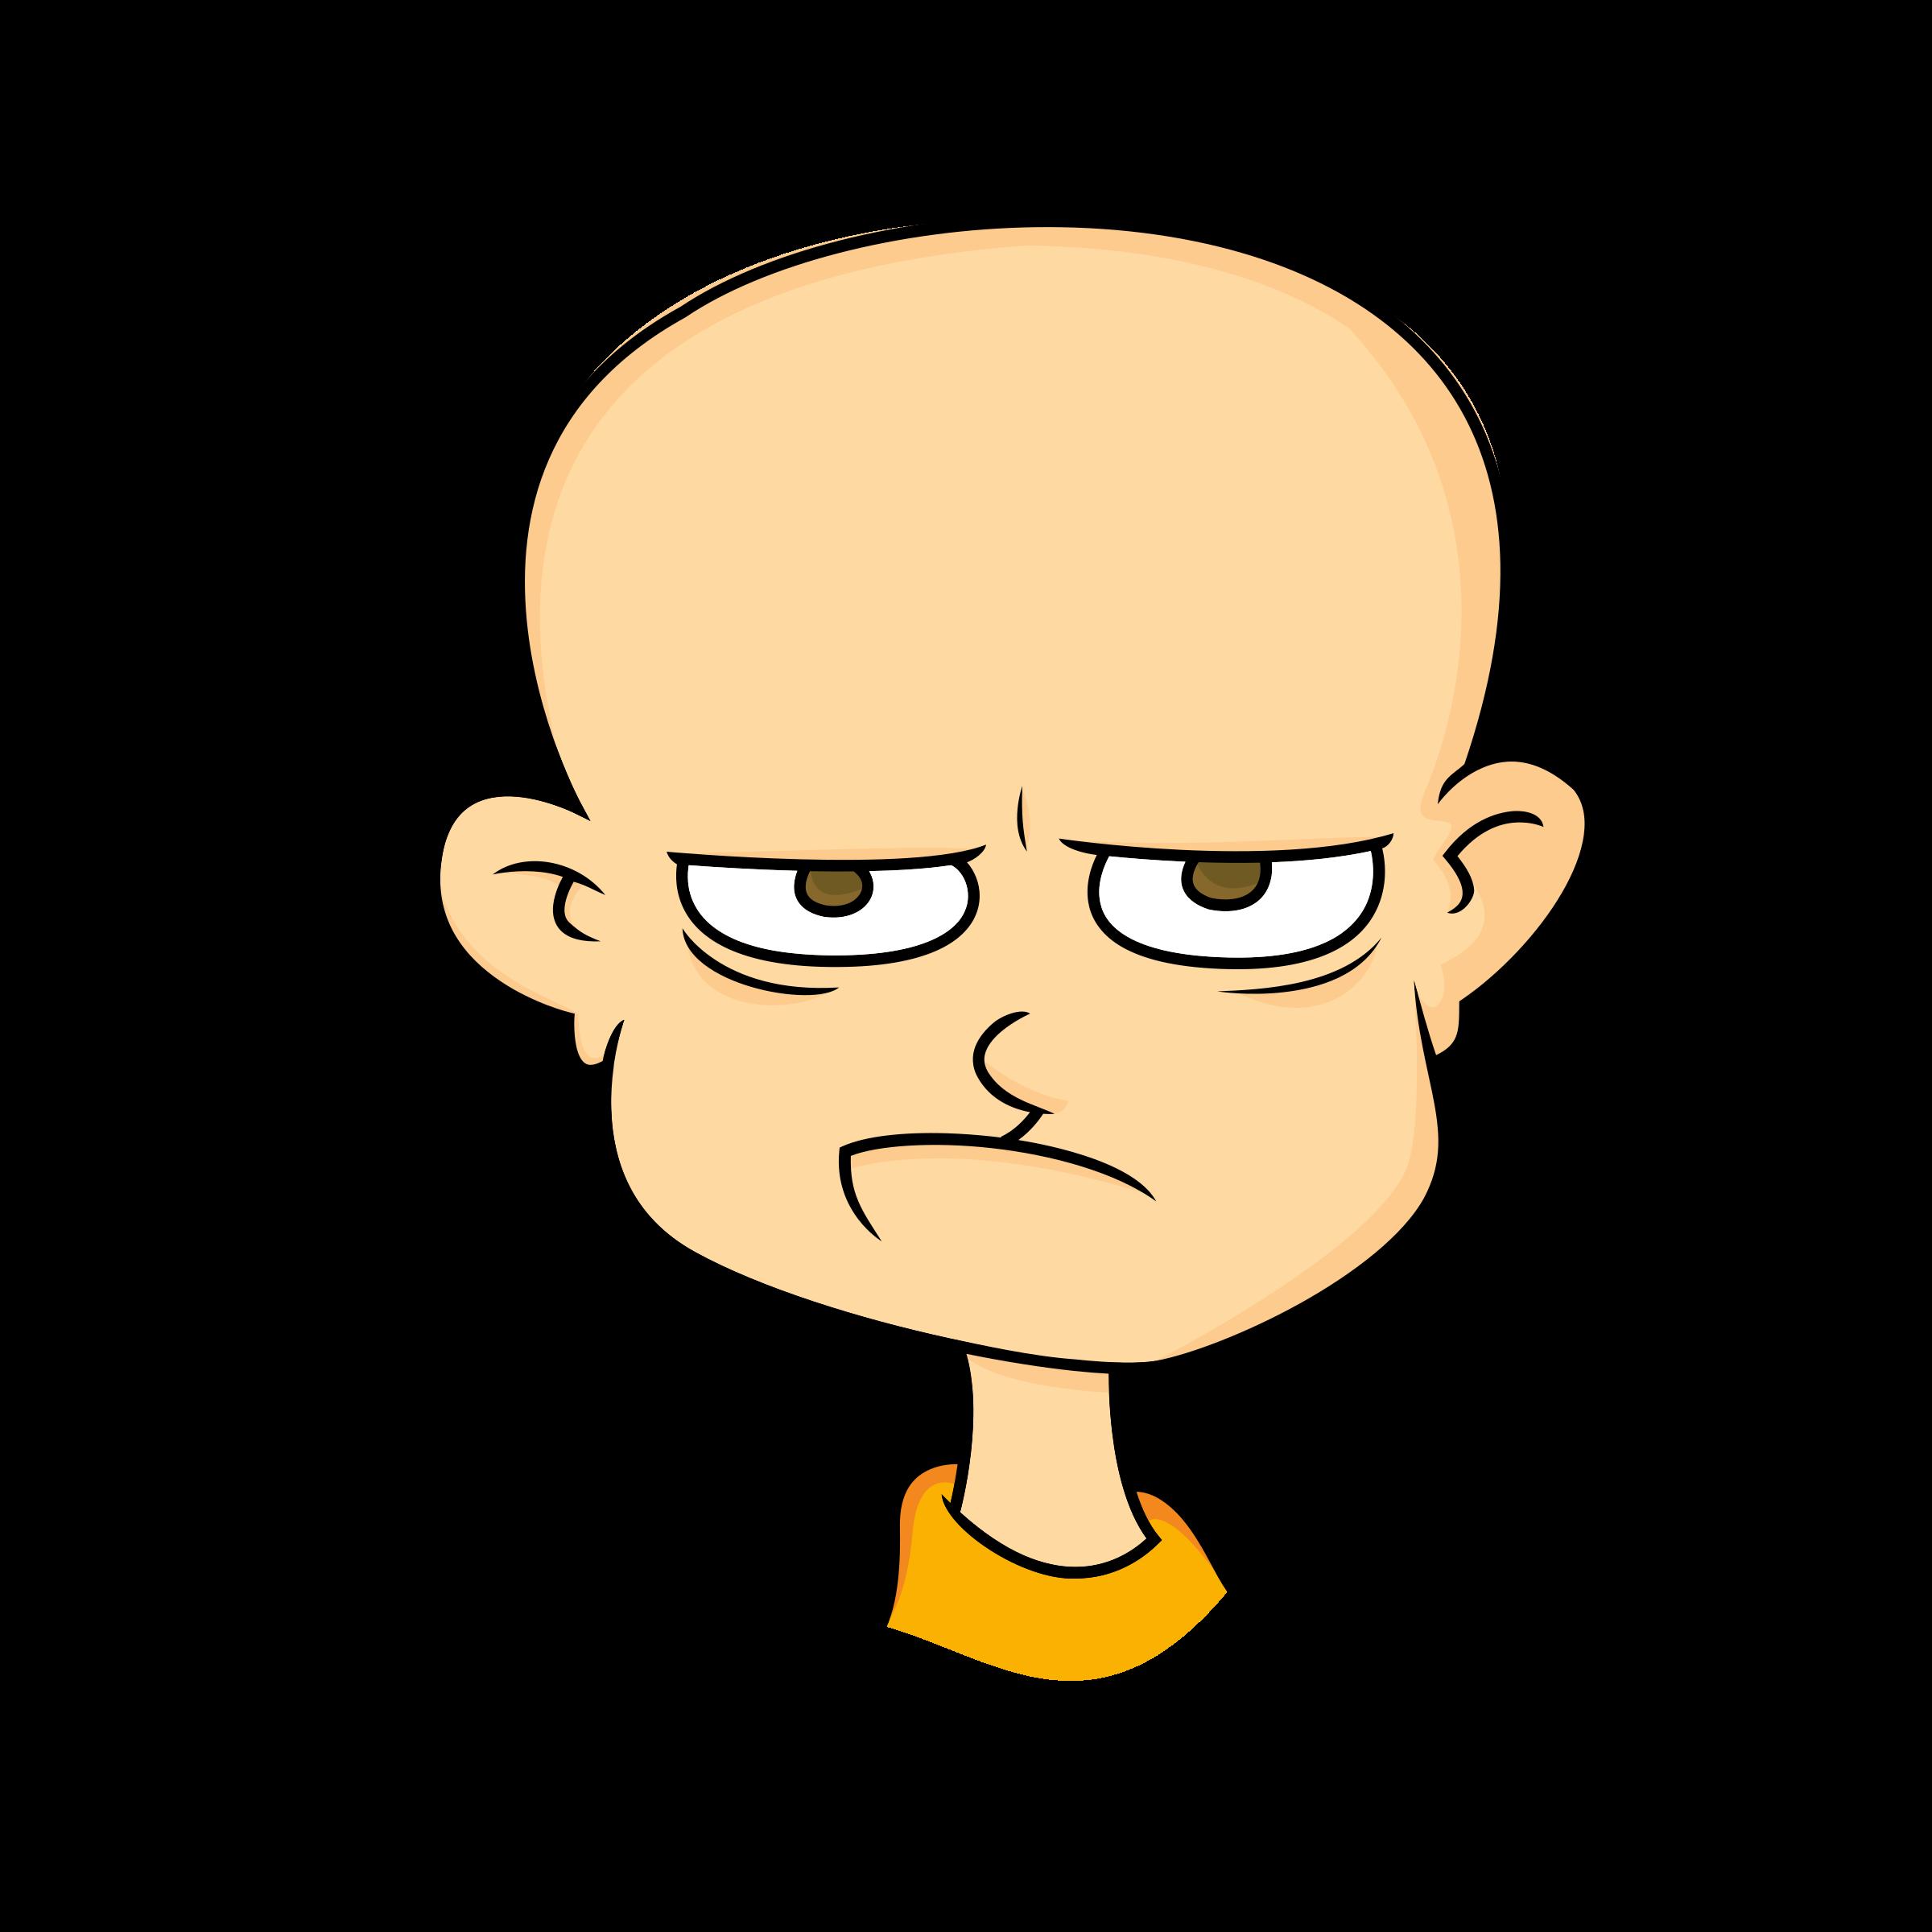 BIG IMAGE (PNG) - PNG Grumpy Face